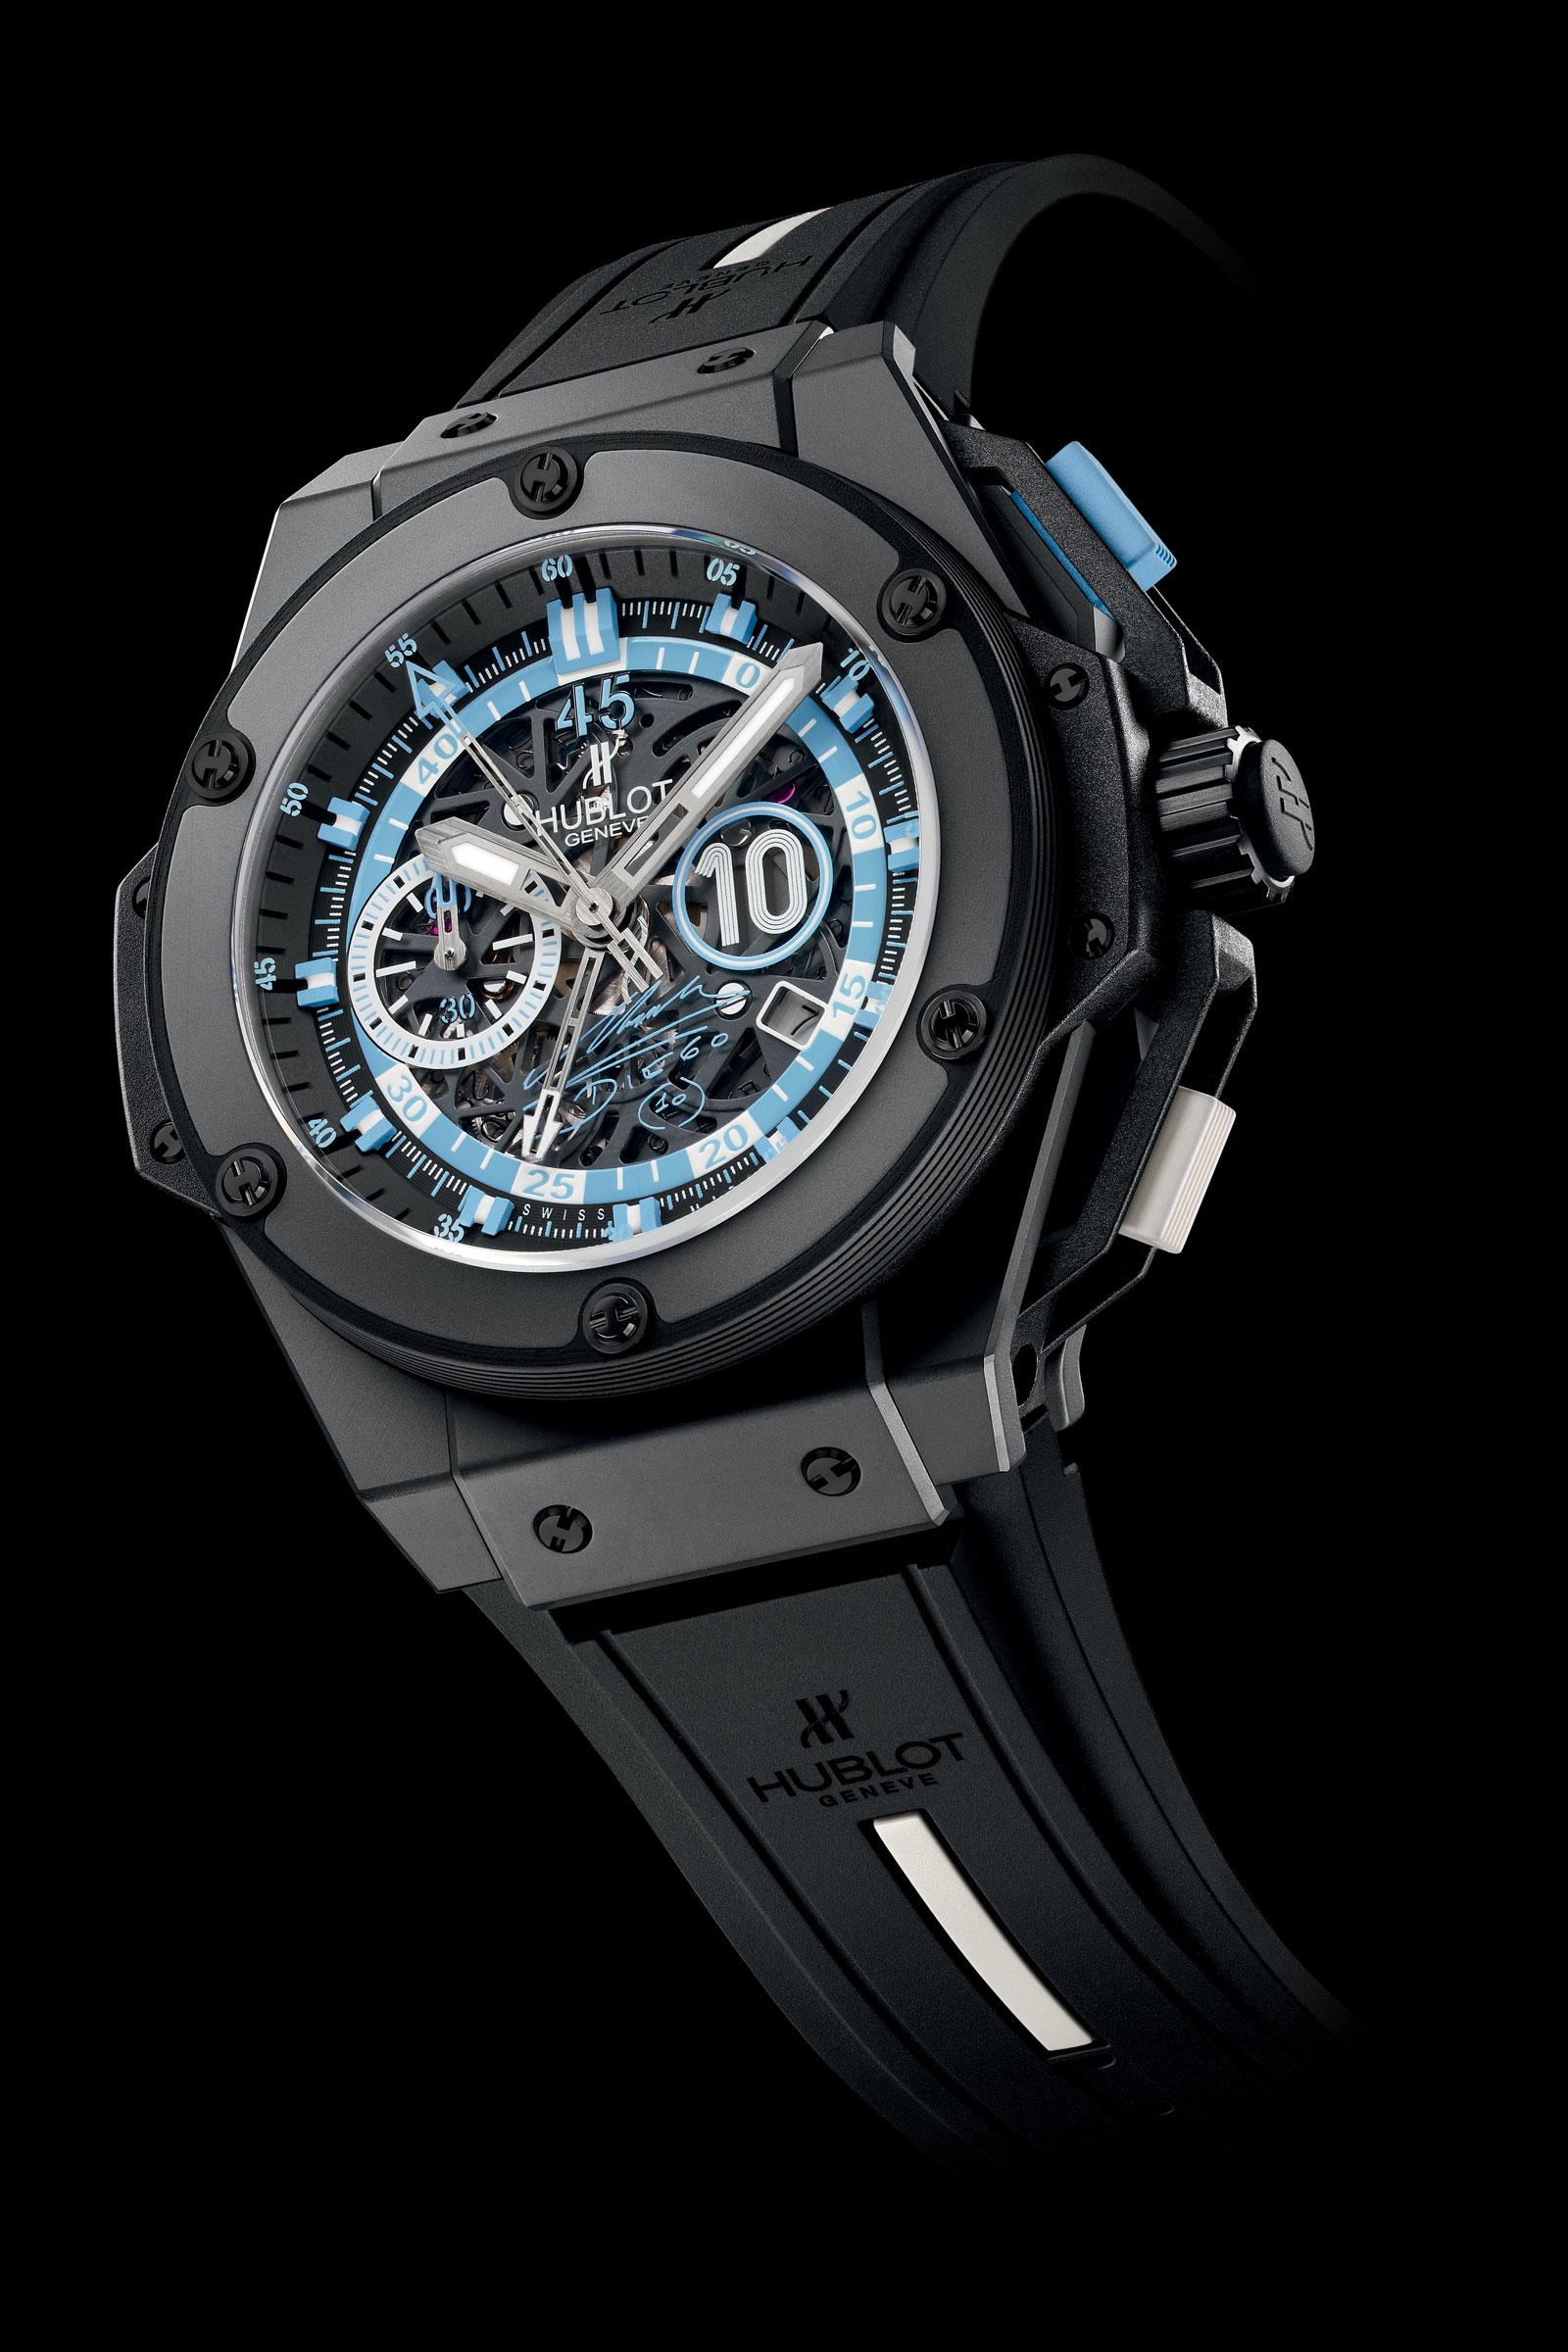 Limited edition hublot king power diego maradona watch extravaganzi for Hublot watches